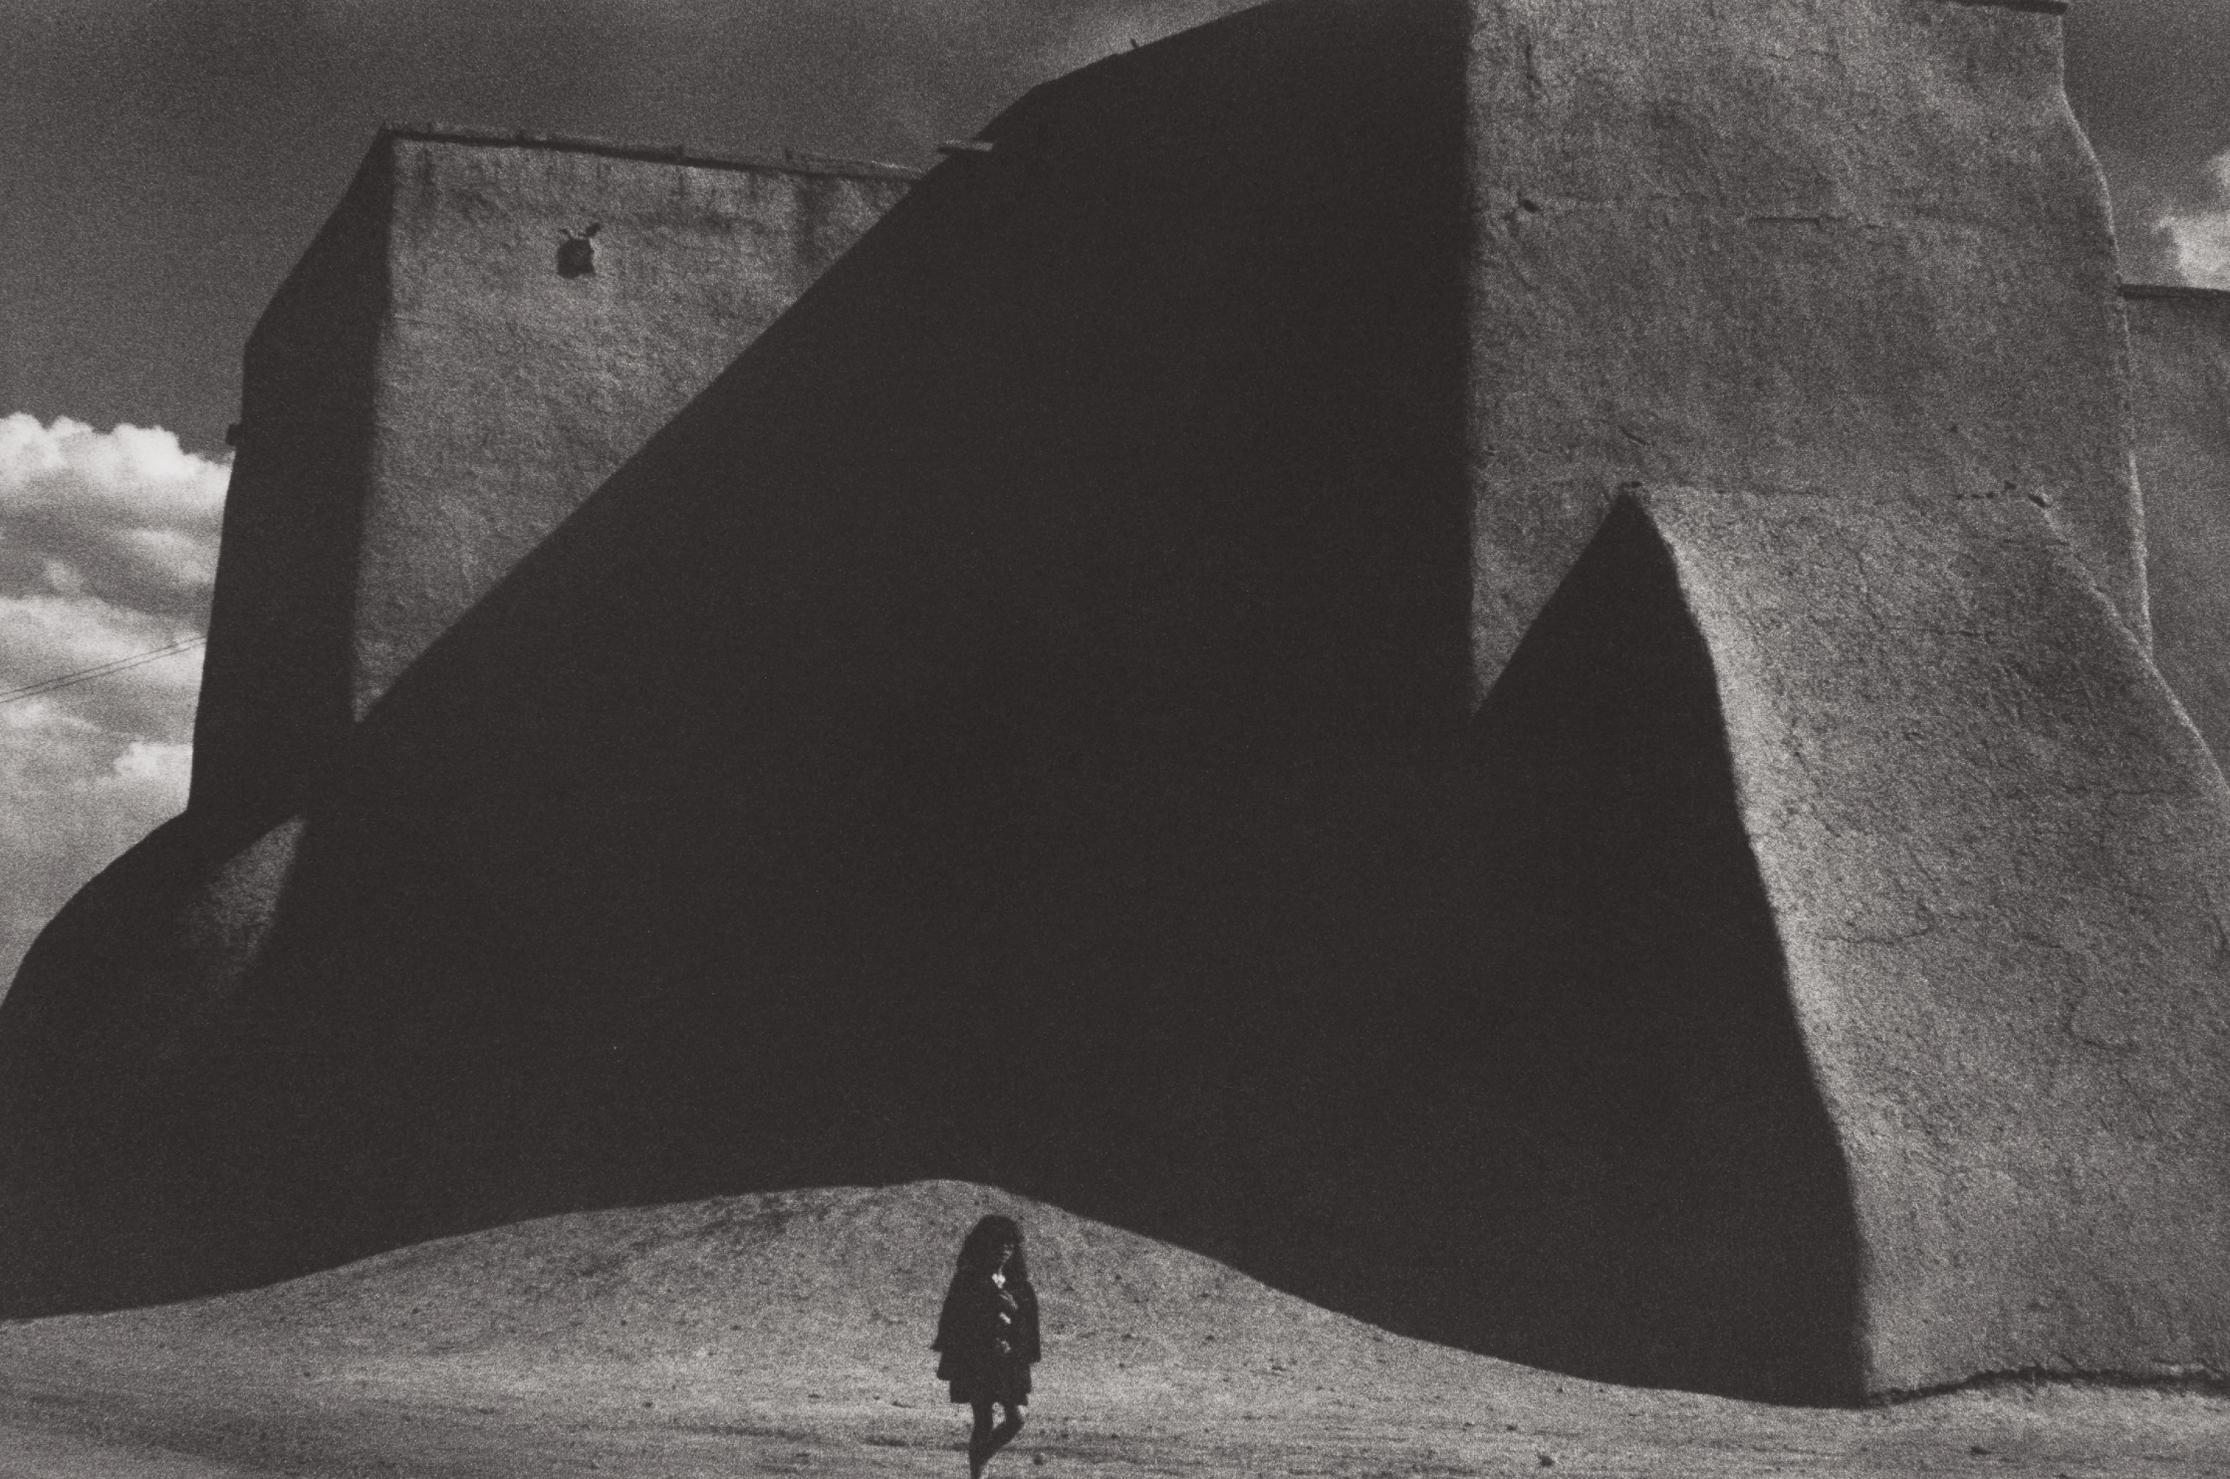 Henri Cartier-Bresson-Taos, New Mexico-1947